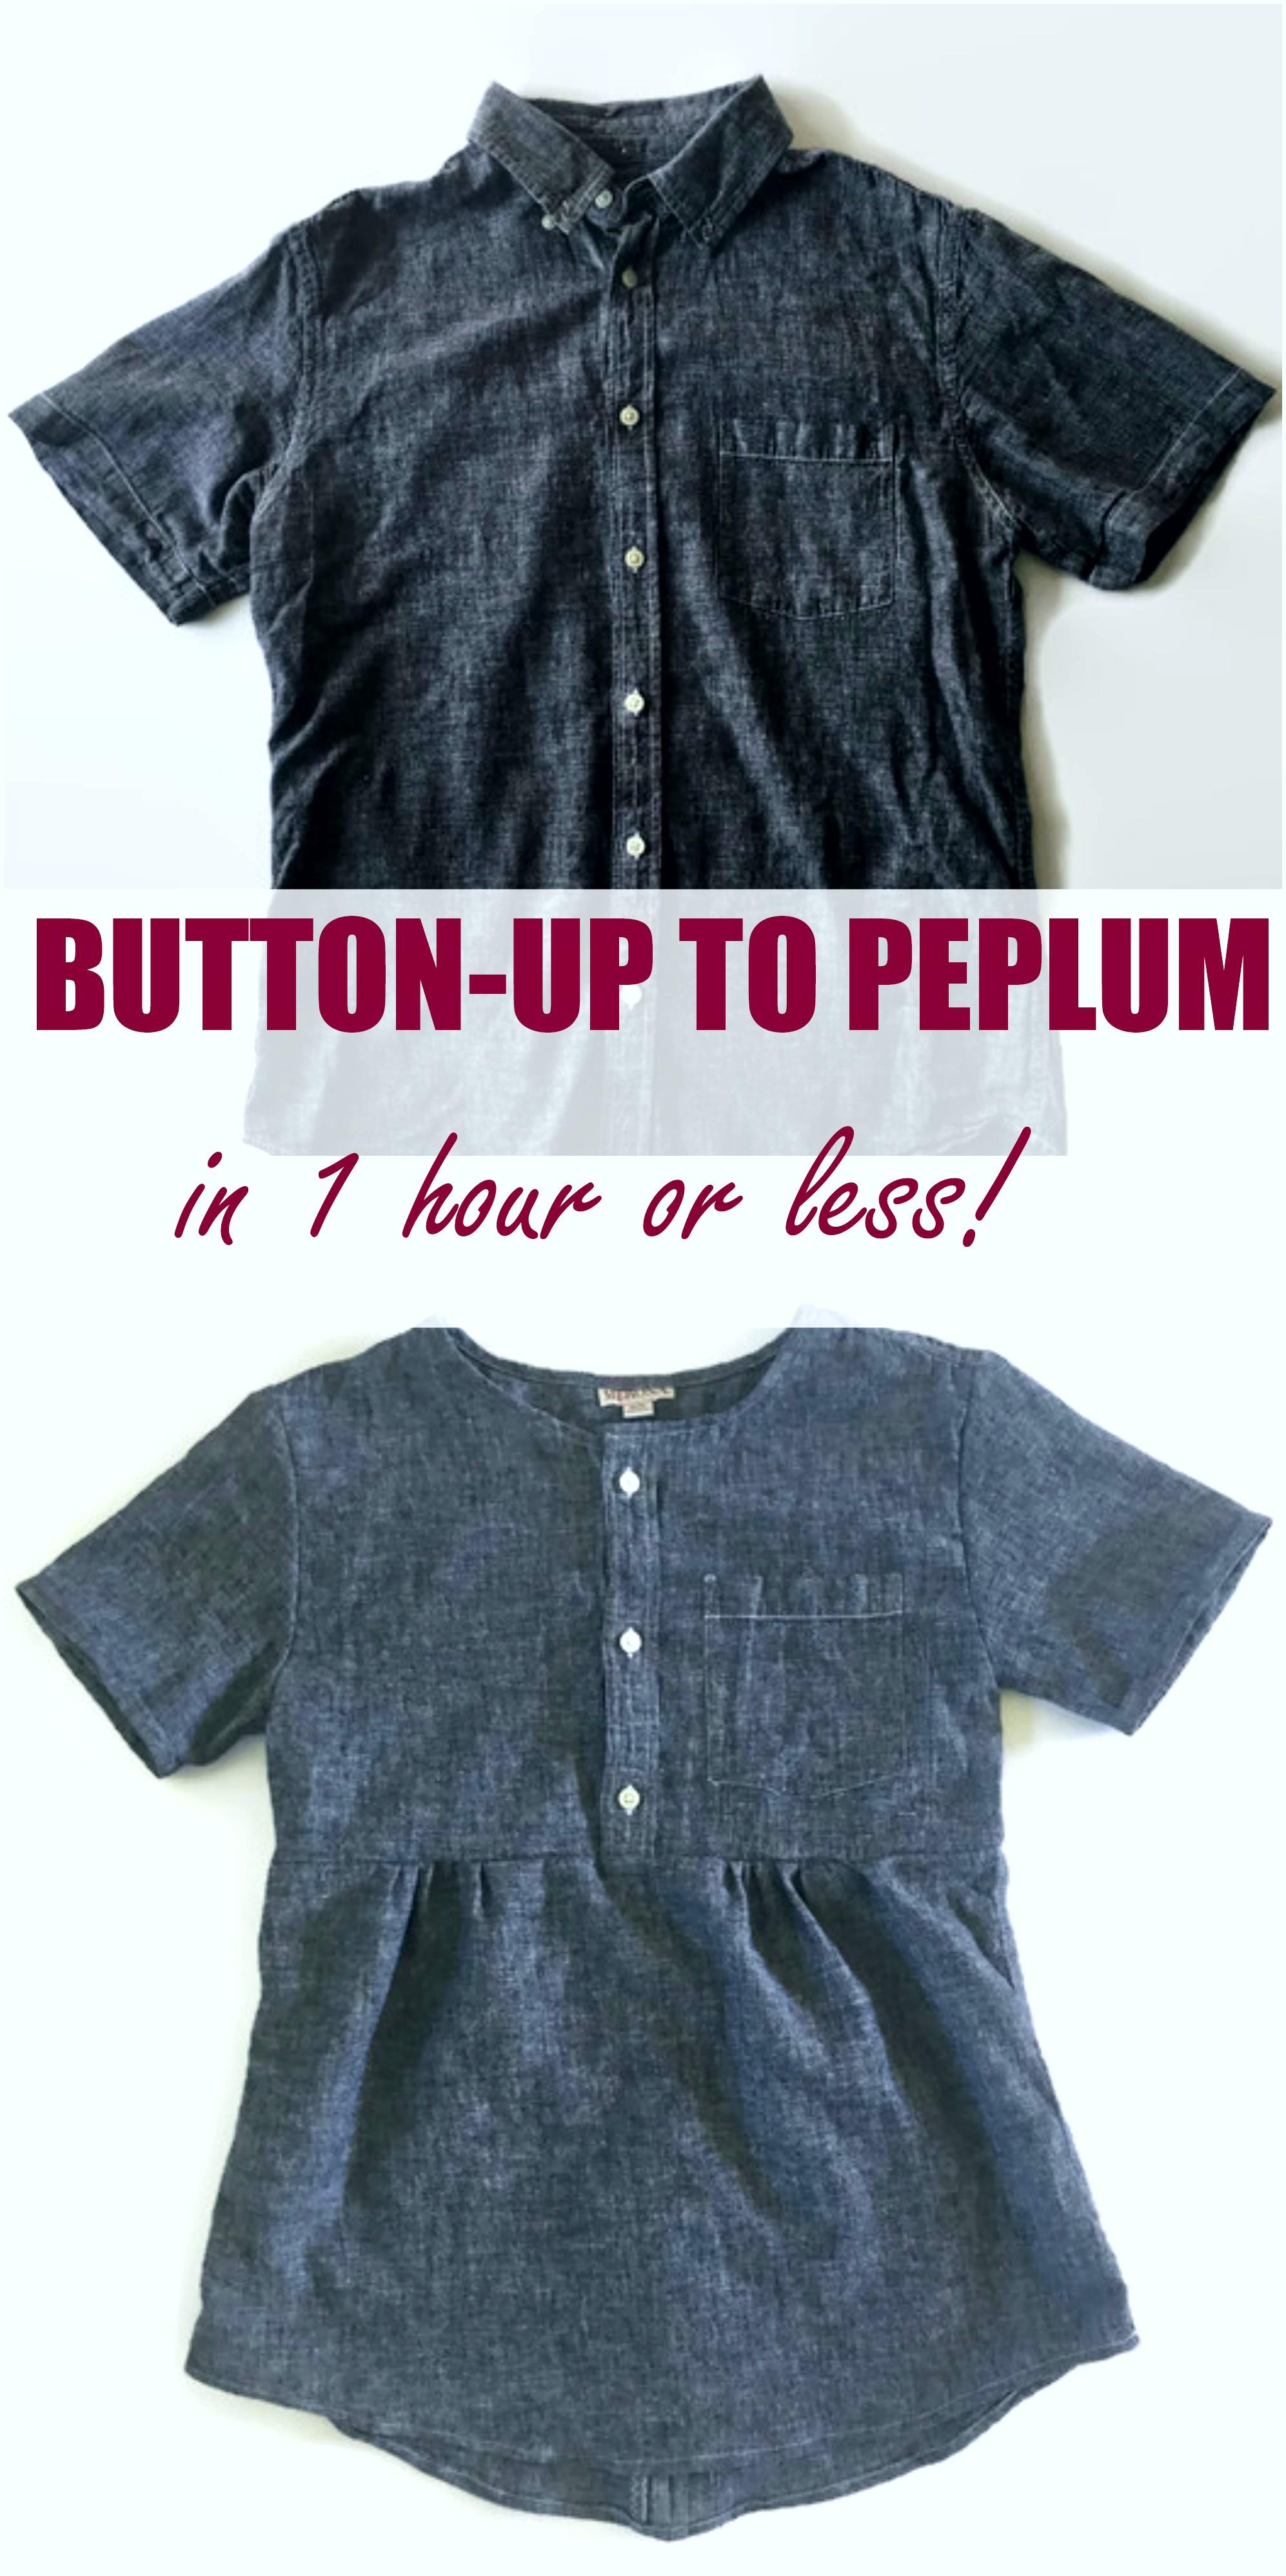 One hour men's button-up to peplum. Easy! brittstitch.com